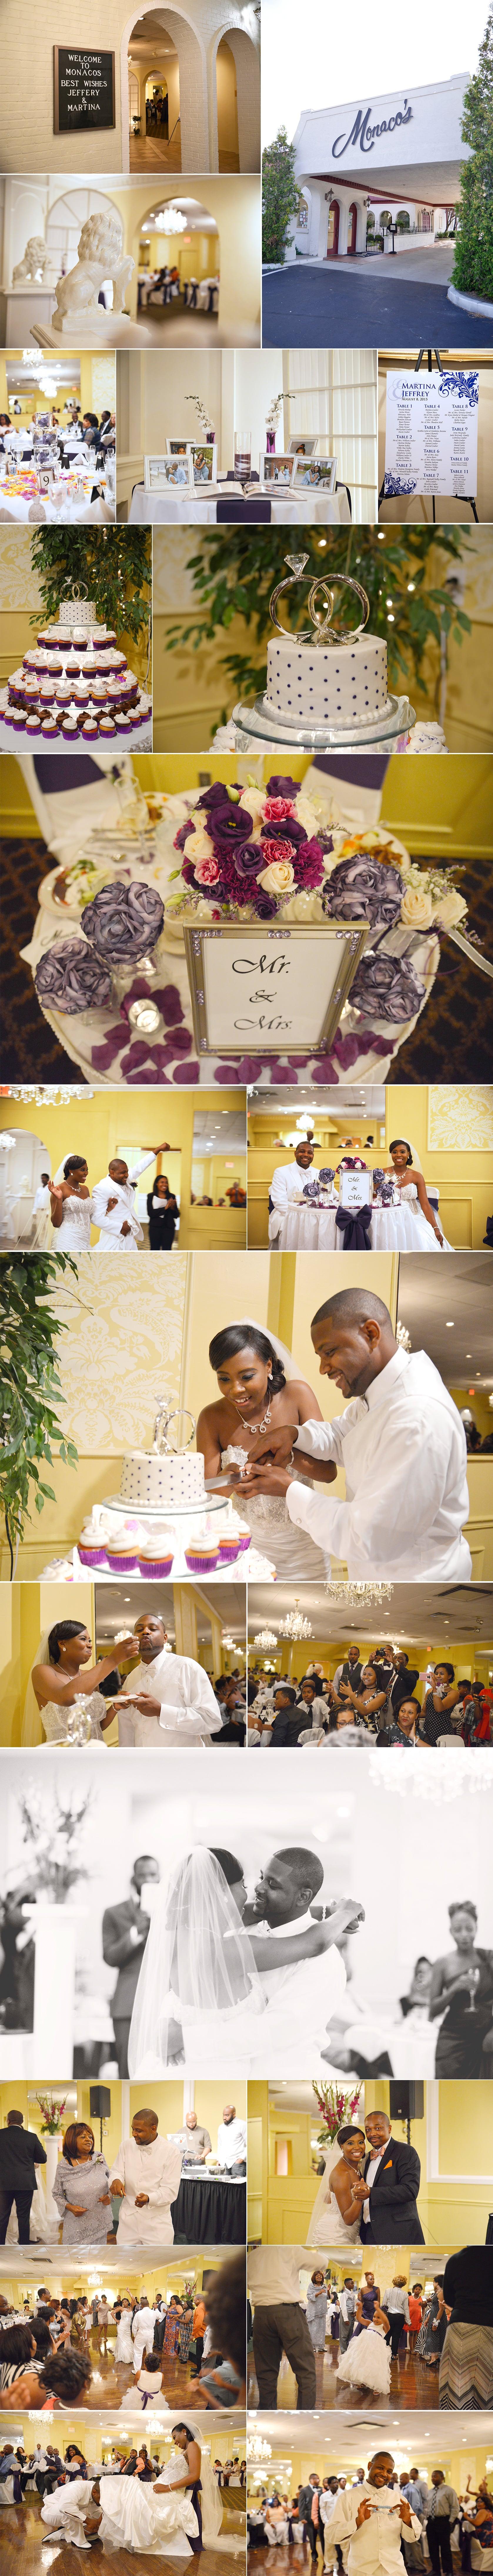 5-wedding photography monaco's place columbus ohio